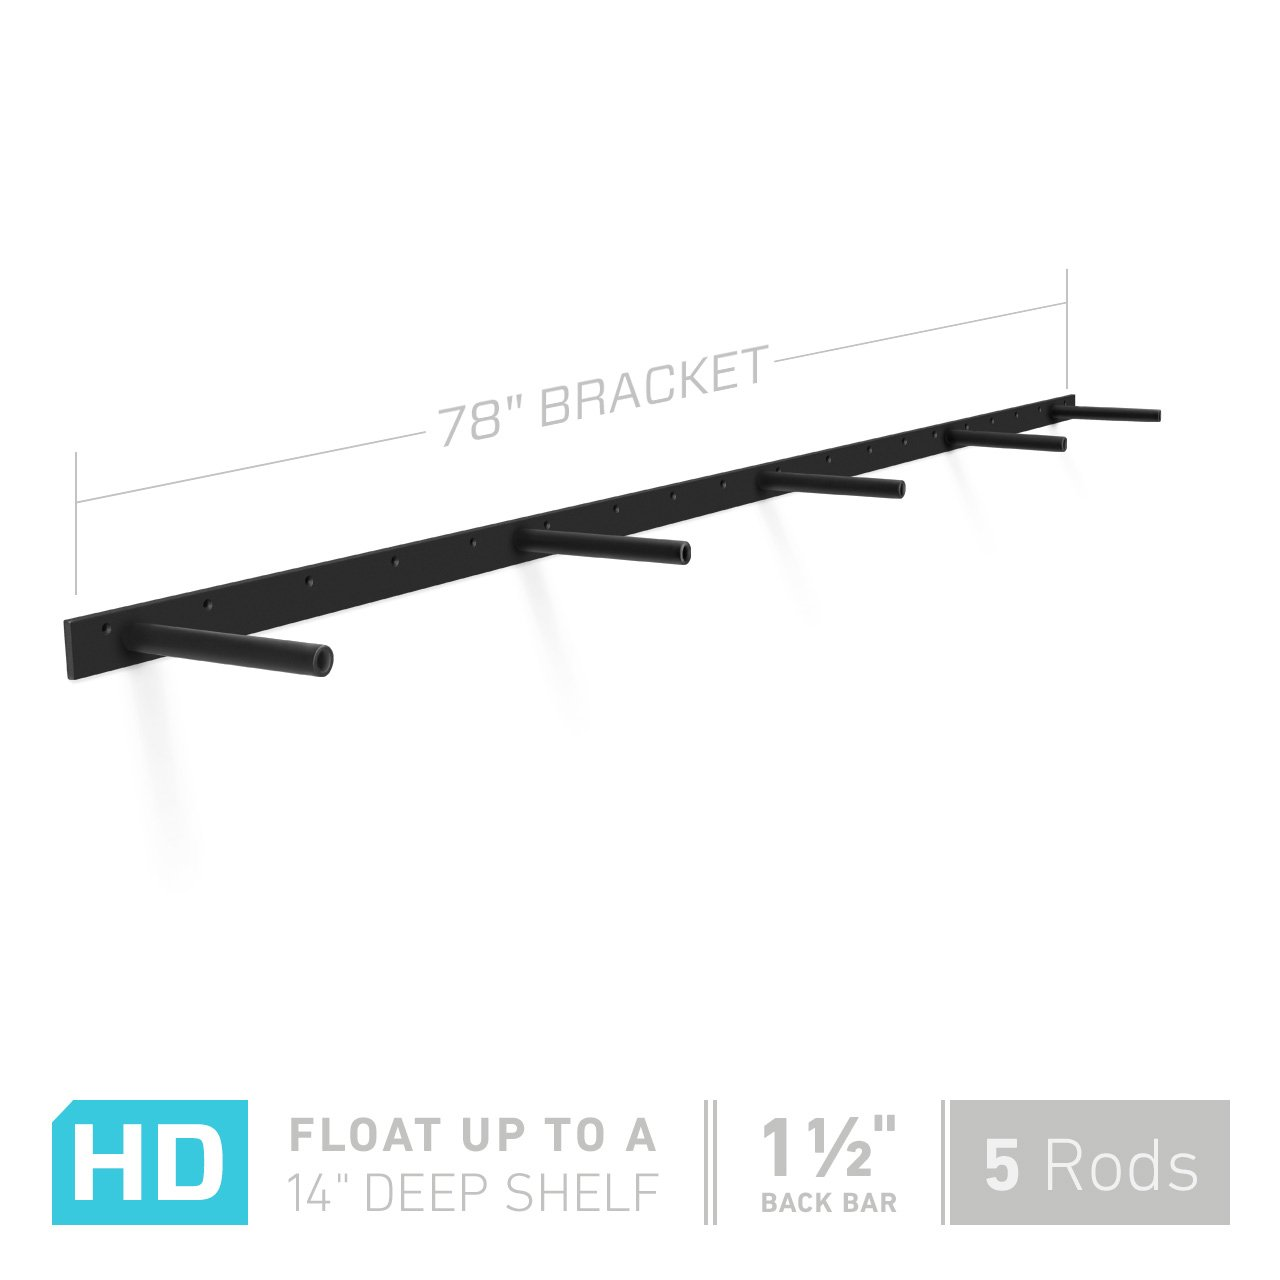 Shelfology 78'' Long Heavy Duty Hidden Shelf Bracket - For 80'' to 96'' floating shelves. Manufactured in USA by Shelfology